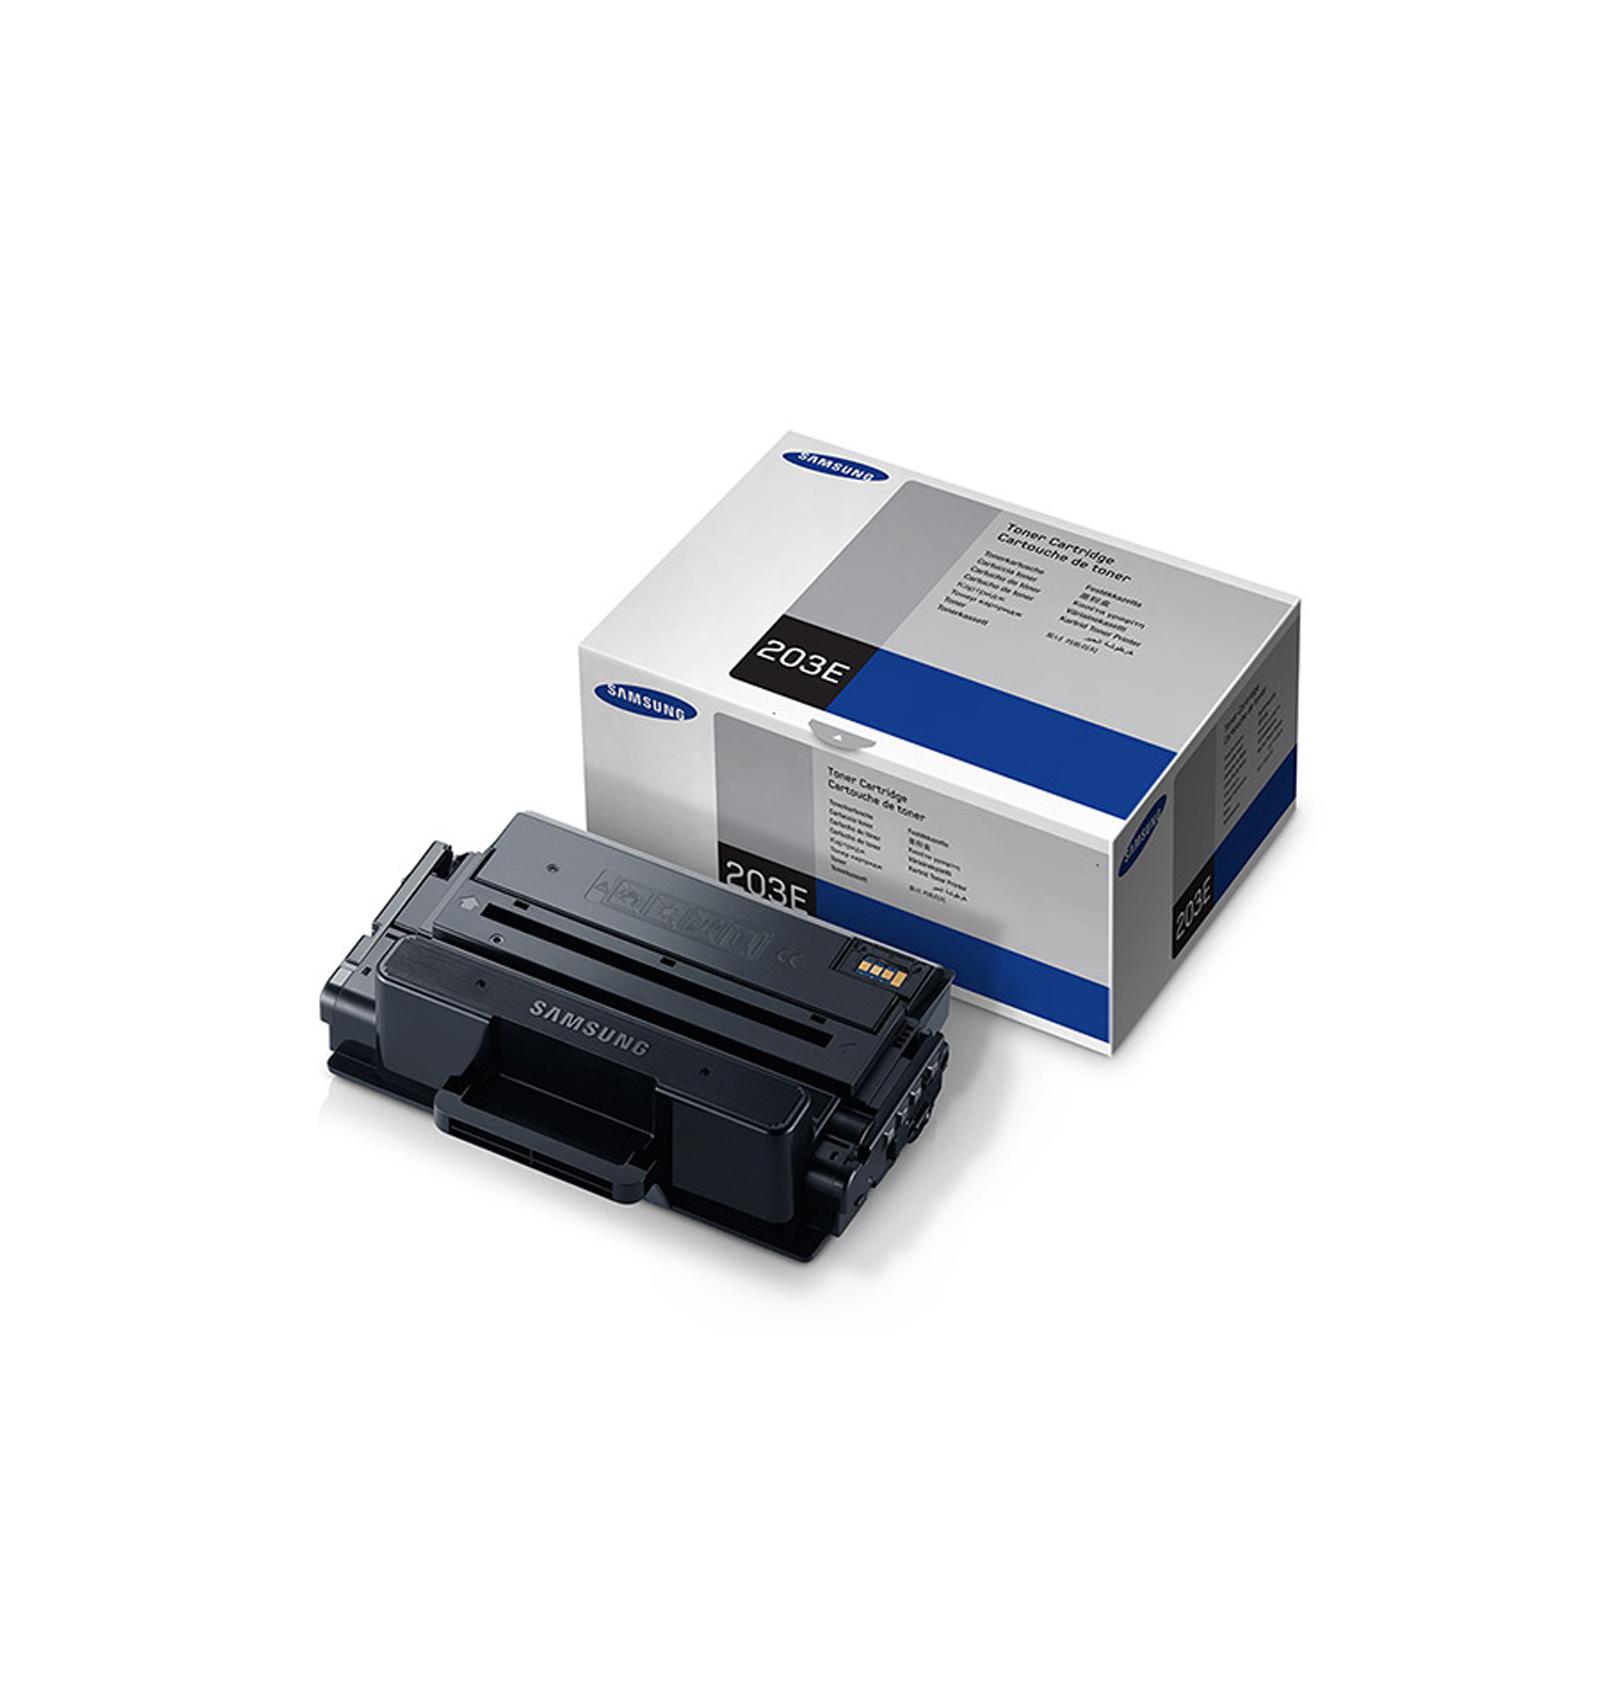 Заправка картриджей Samsung MLT-D203E для SL-M3820/4020/M3870/4070